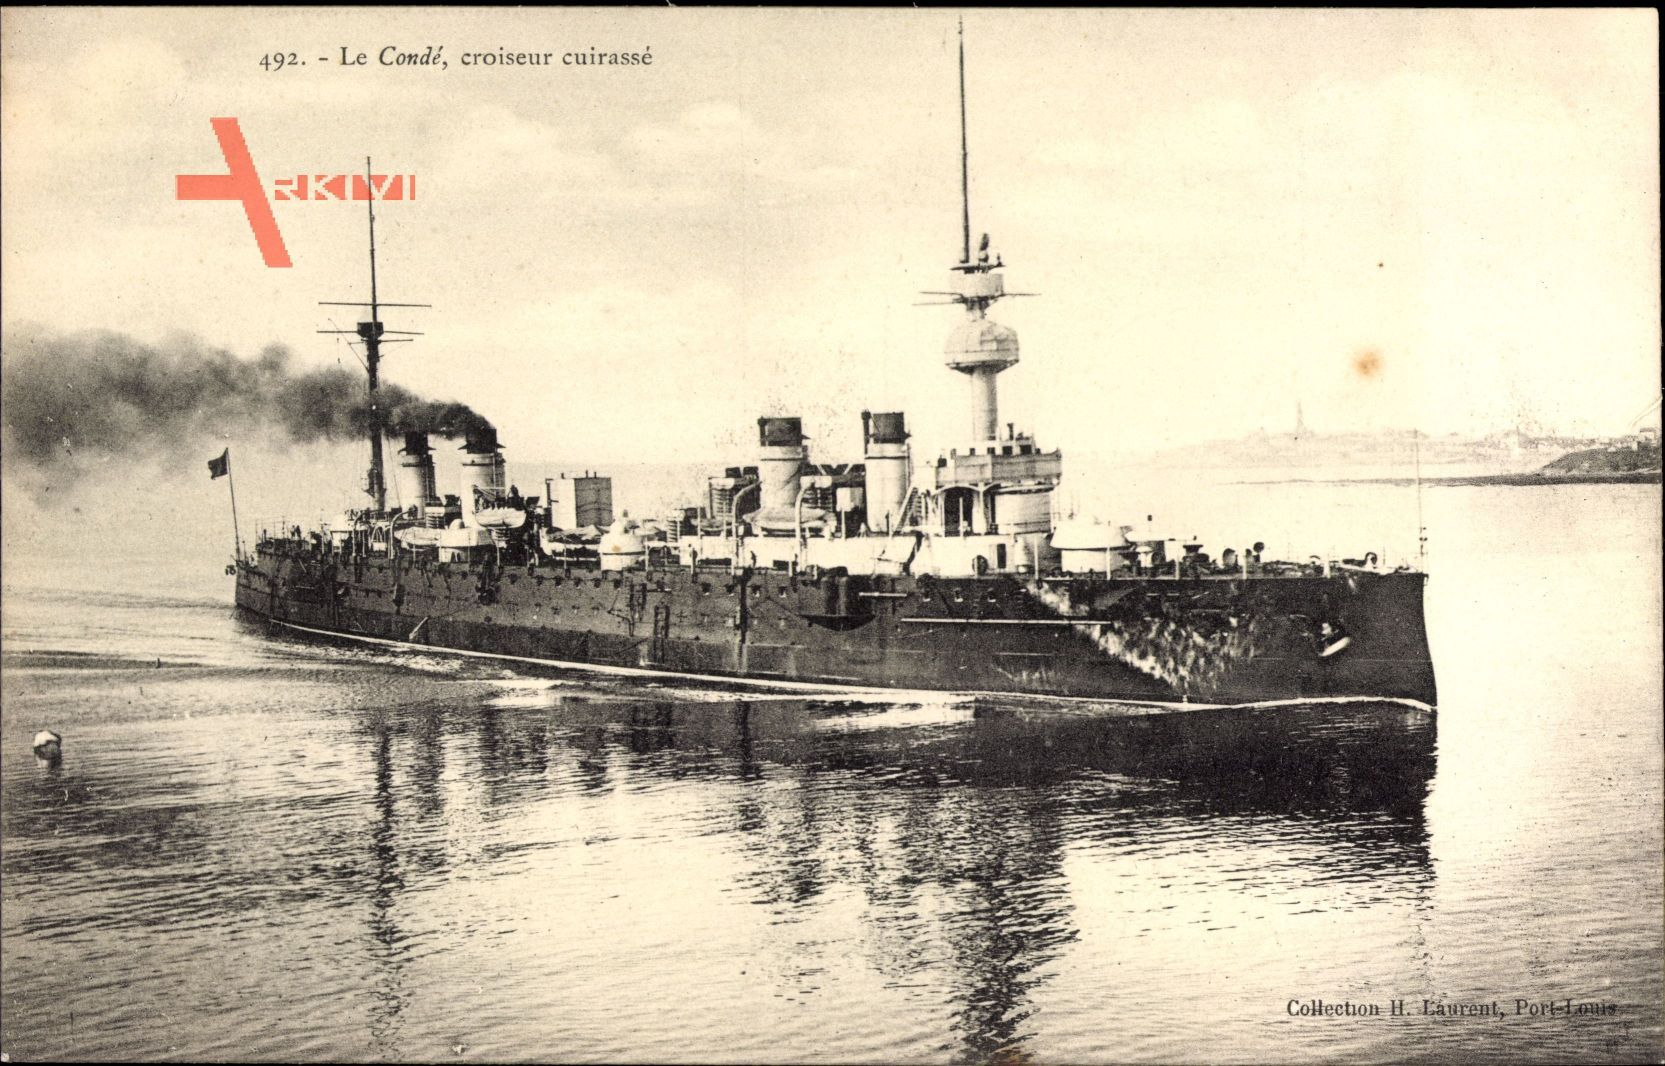 Französisches Kriegsschiff, Condé, Croiseur cuirassé